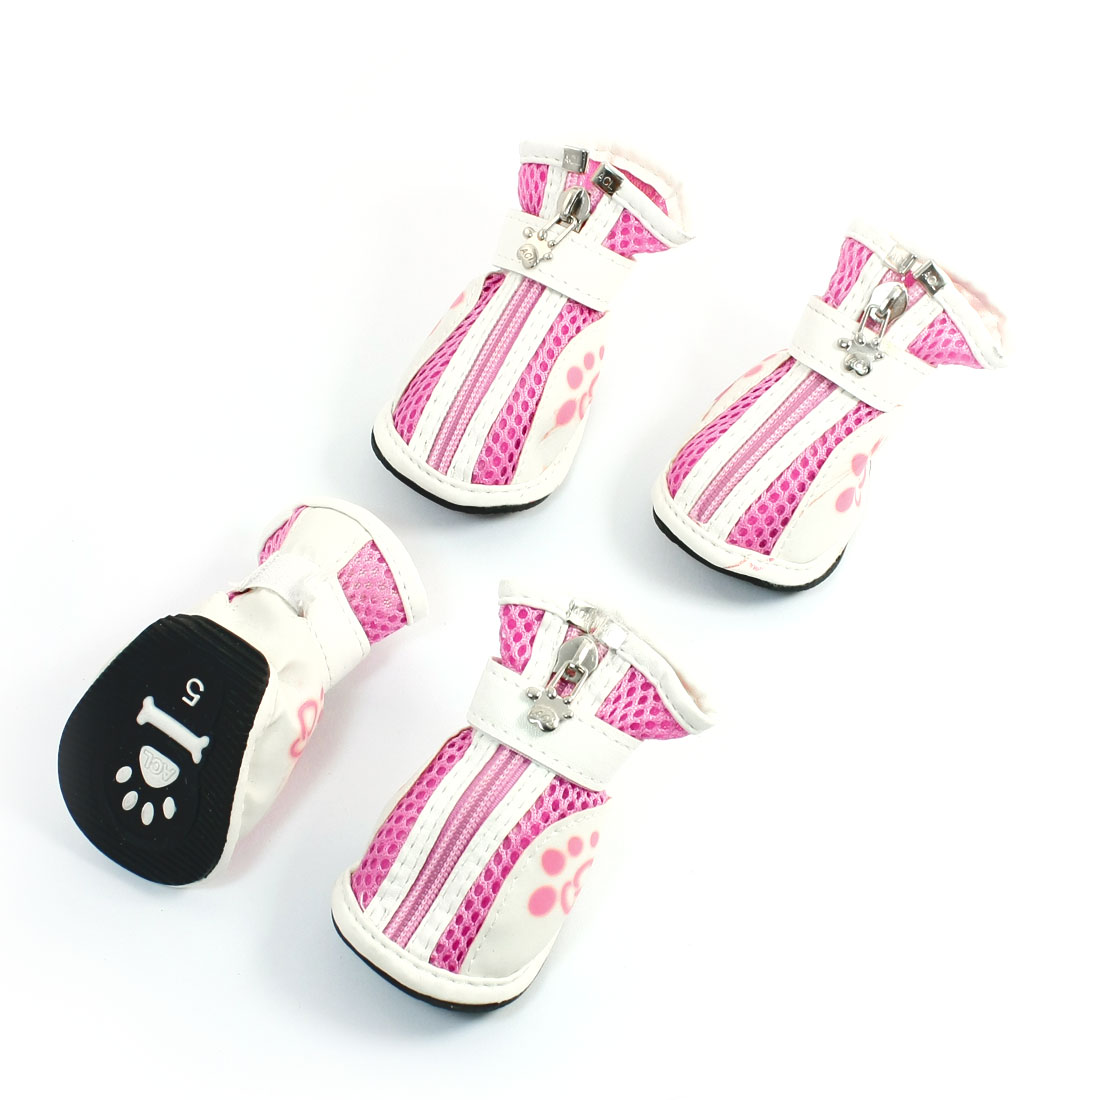 Nonslip Outsole Pink White Detachable Mesh Pet Dog Shoes Boots Size 5